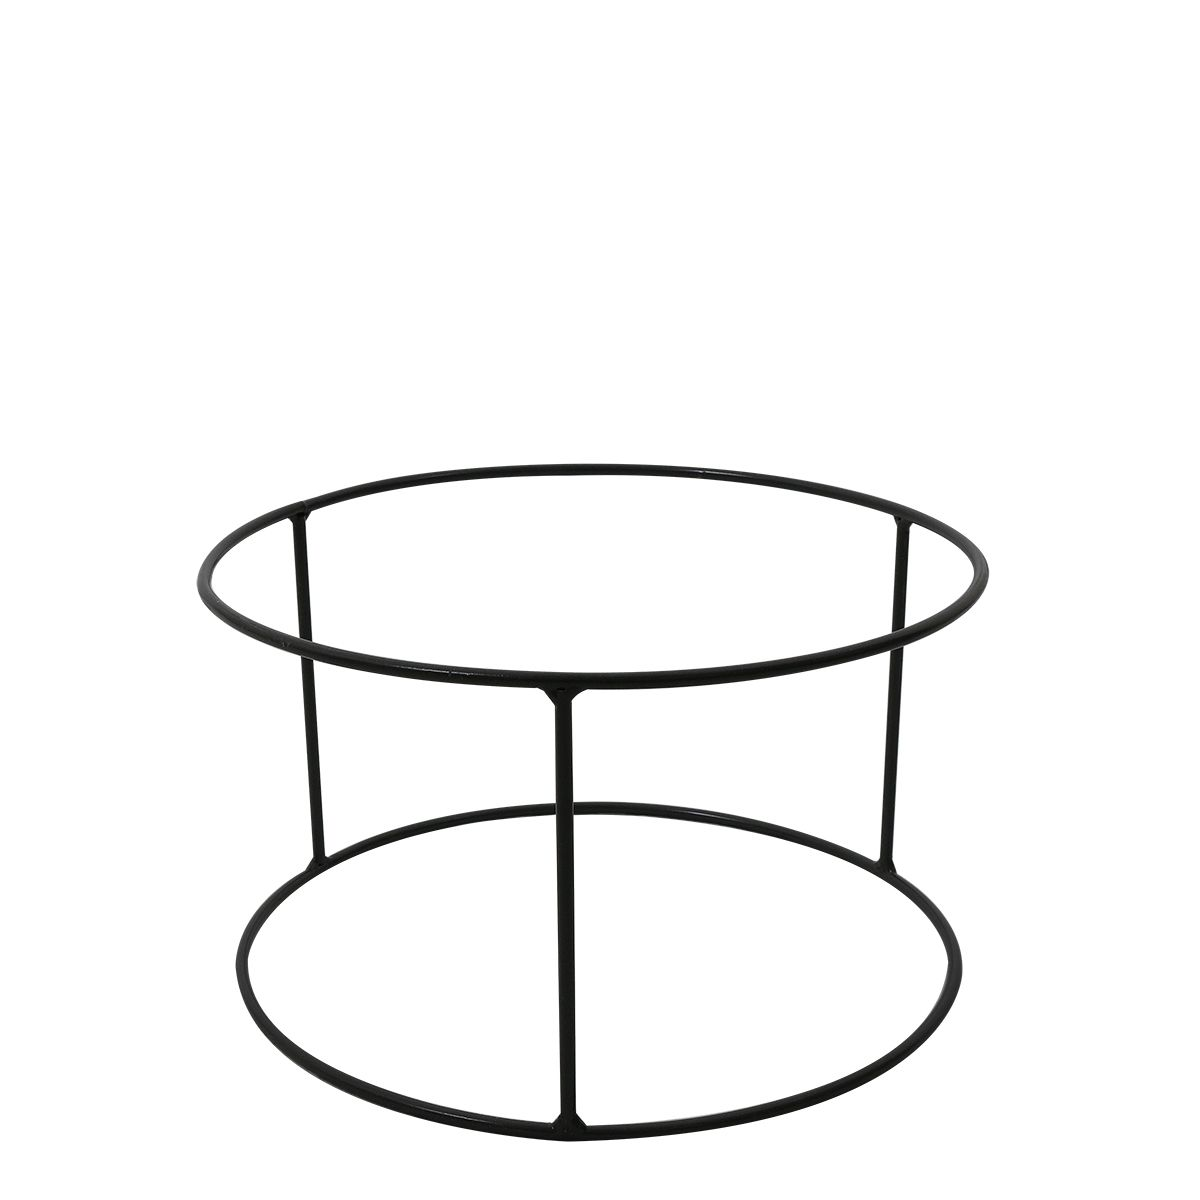 Suporte Ferro Vaso Loft 25 x 15 cm Grafite - VASART